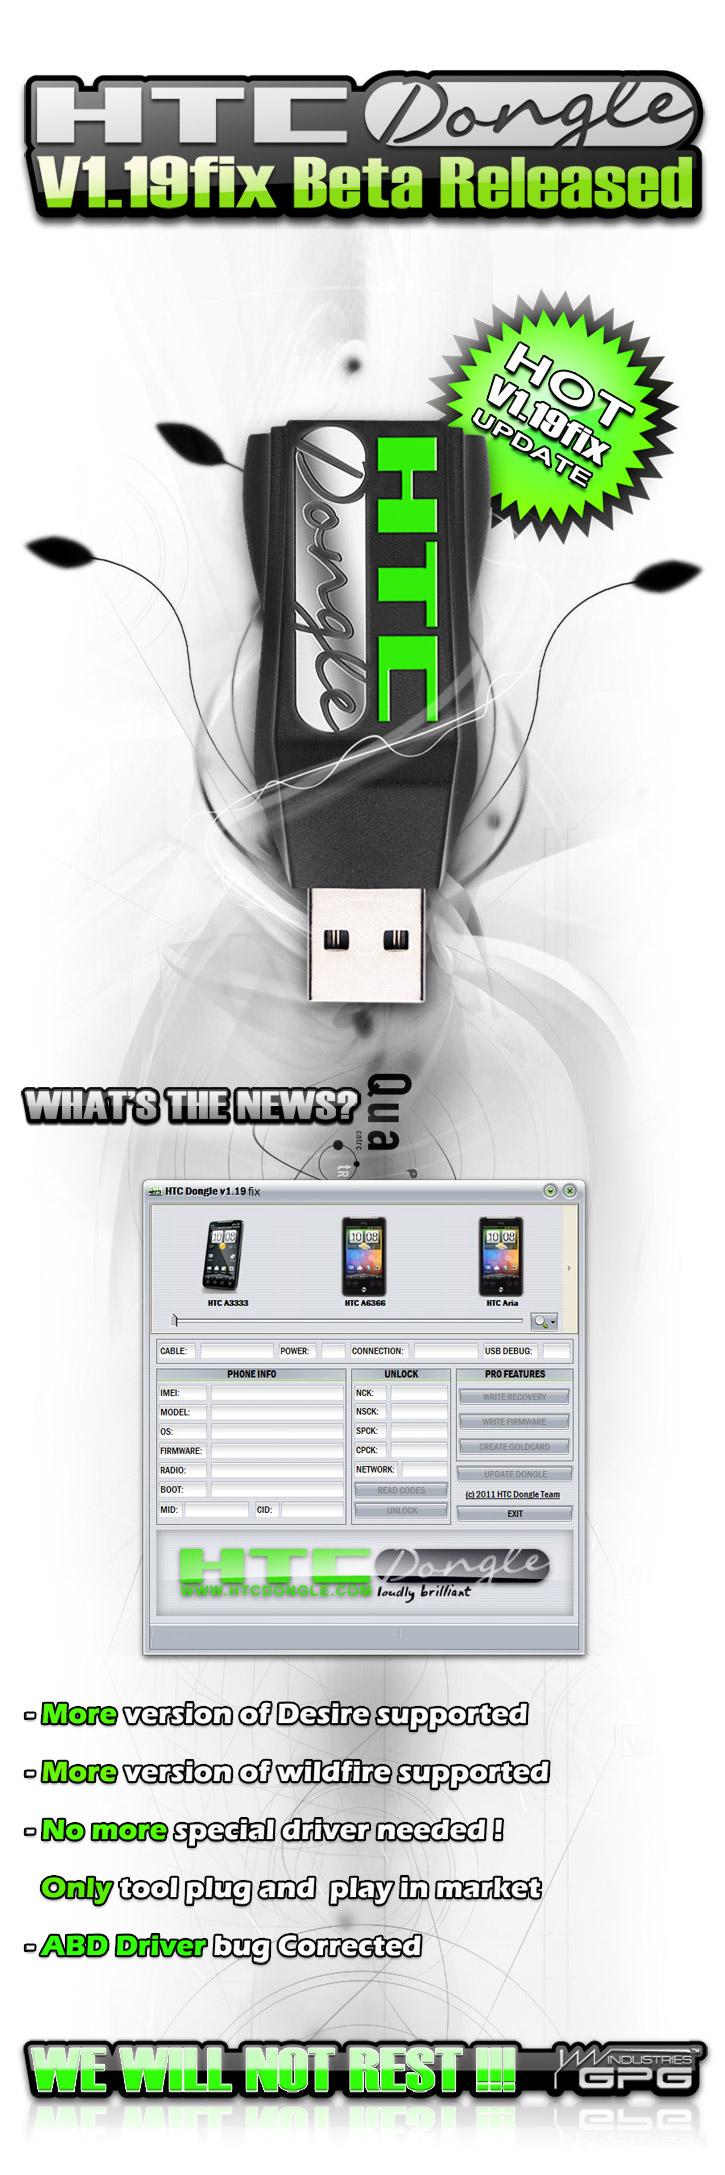 2011 04 27  HTCDongle V119fix Beta Released 725